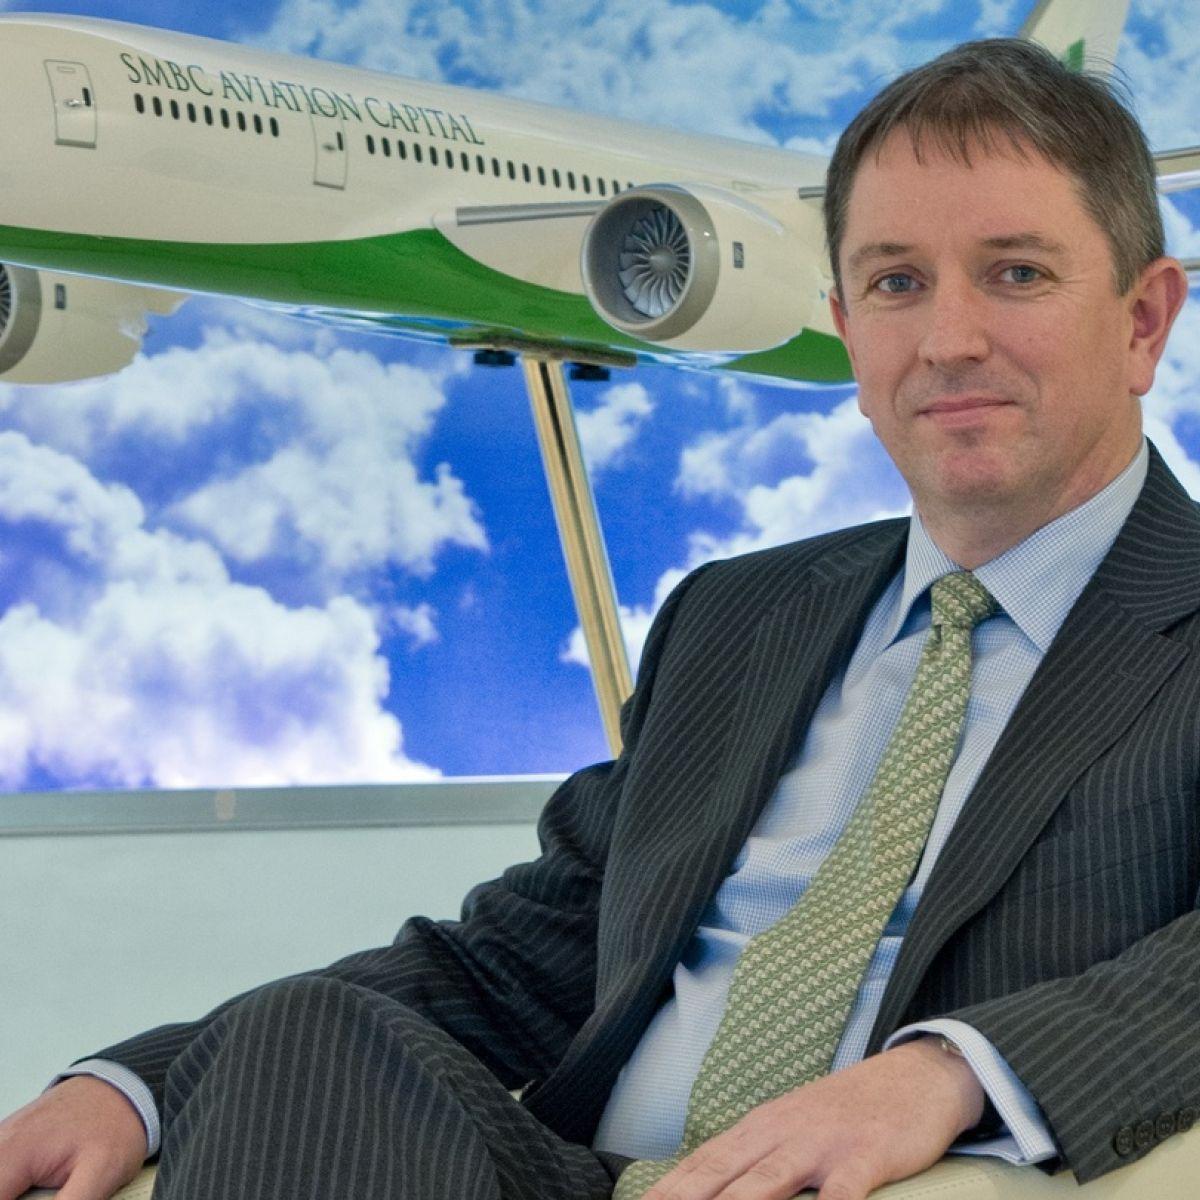 Aircraft leasing worth more than €500m to Irish economy